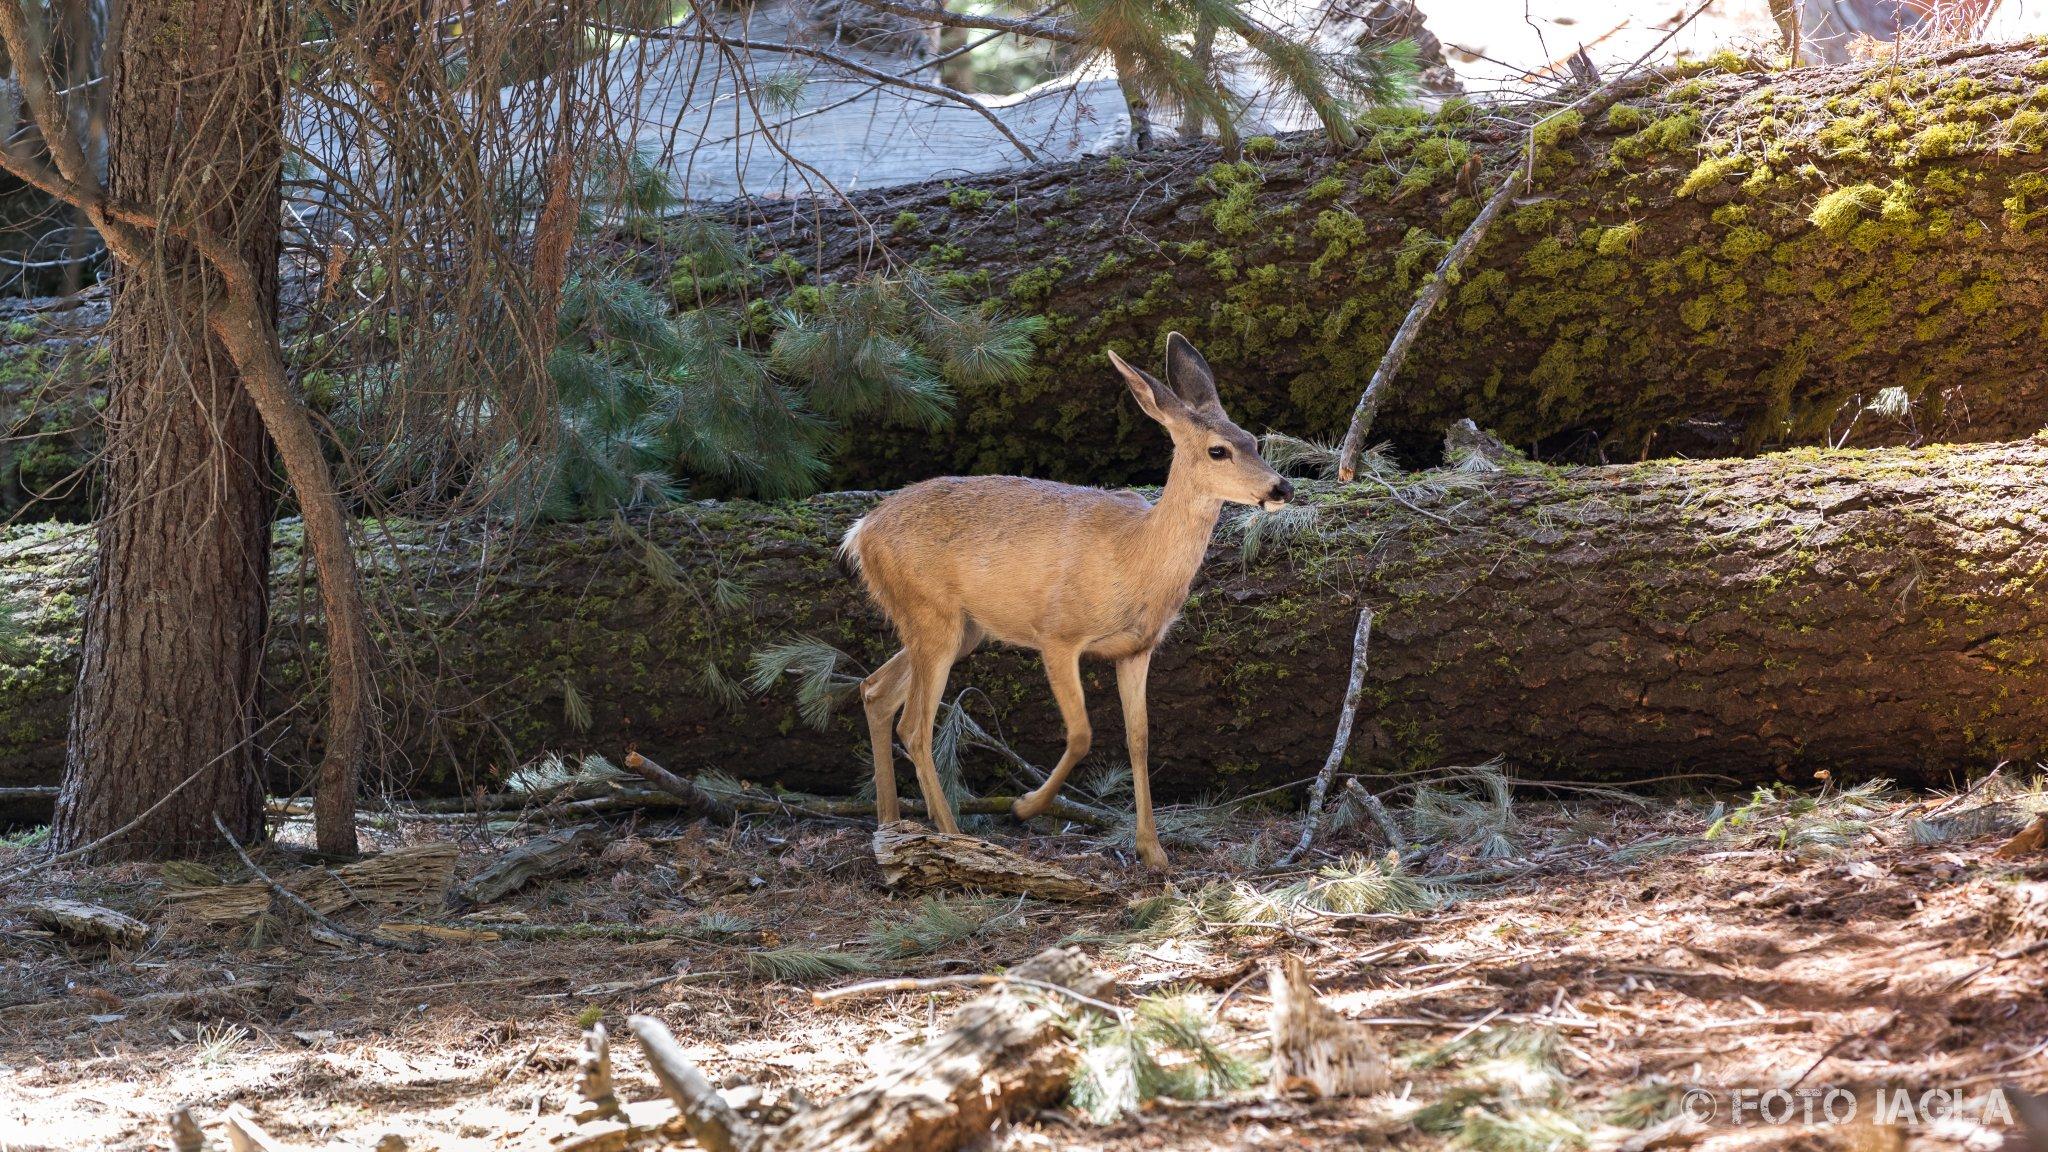 Kalifornien - September 2018 Rehkitz am General Sherman Tree Sequoia National Park - Tulare Country